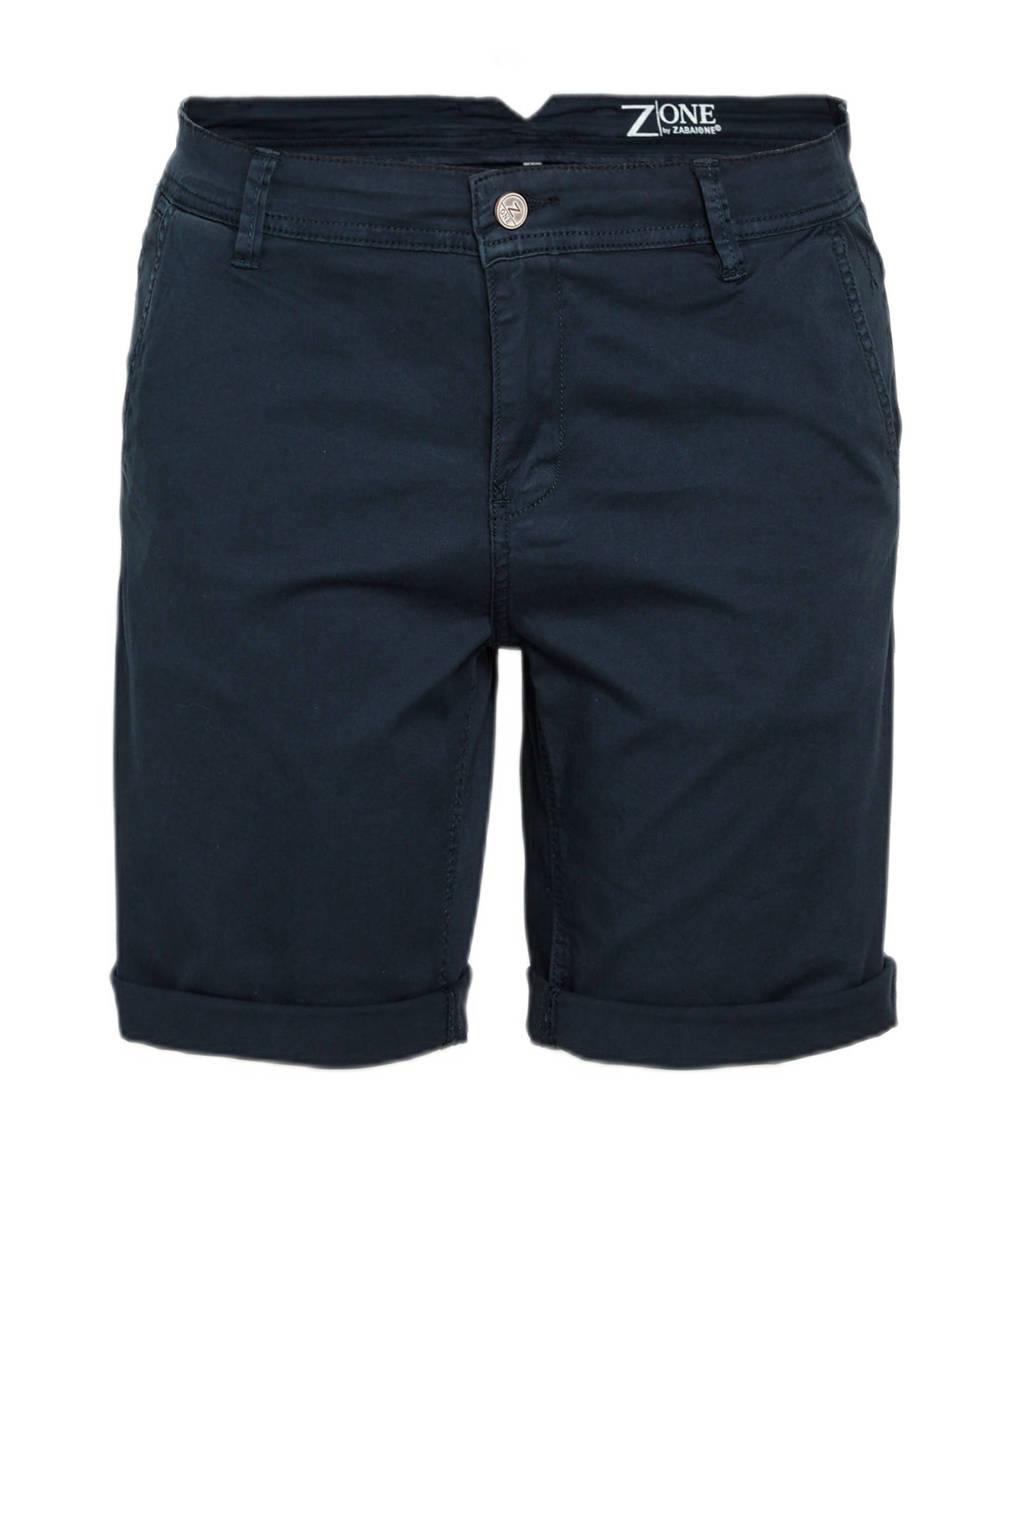 z-one korte broek Priska  donkerblauw, Donkerblauw